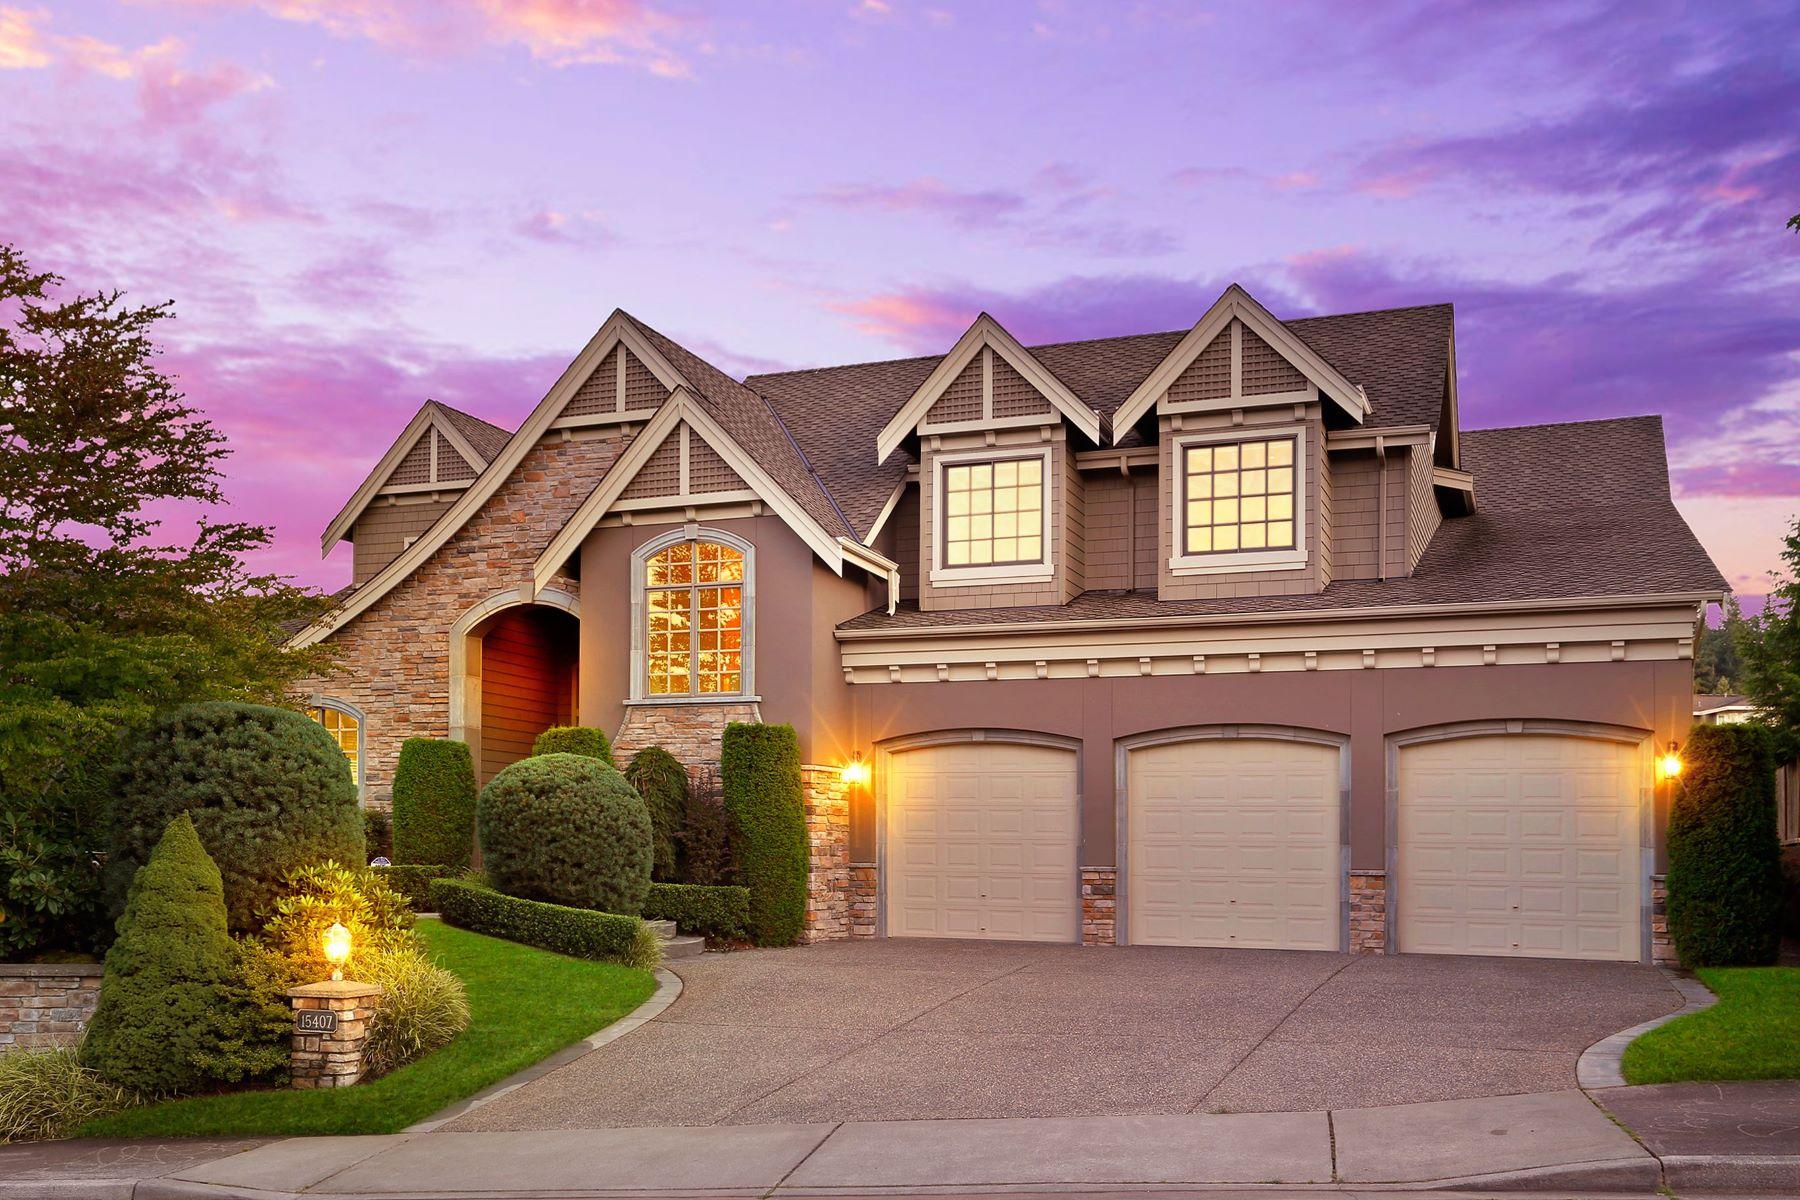 Single Family Homes for Sale at 15407 Southeast 80th Street, Newcastle, WA 98059 15407 SE 80th St Newcastle, Washington 98059 United States